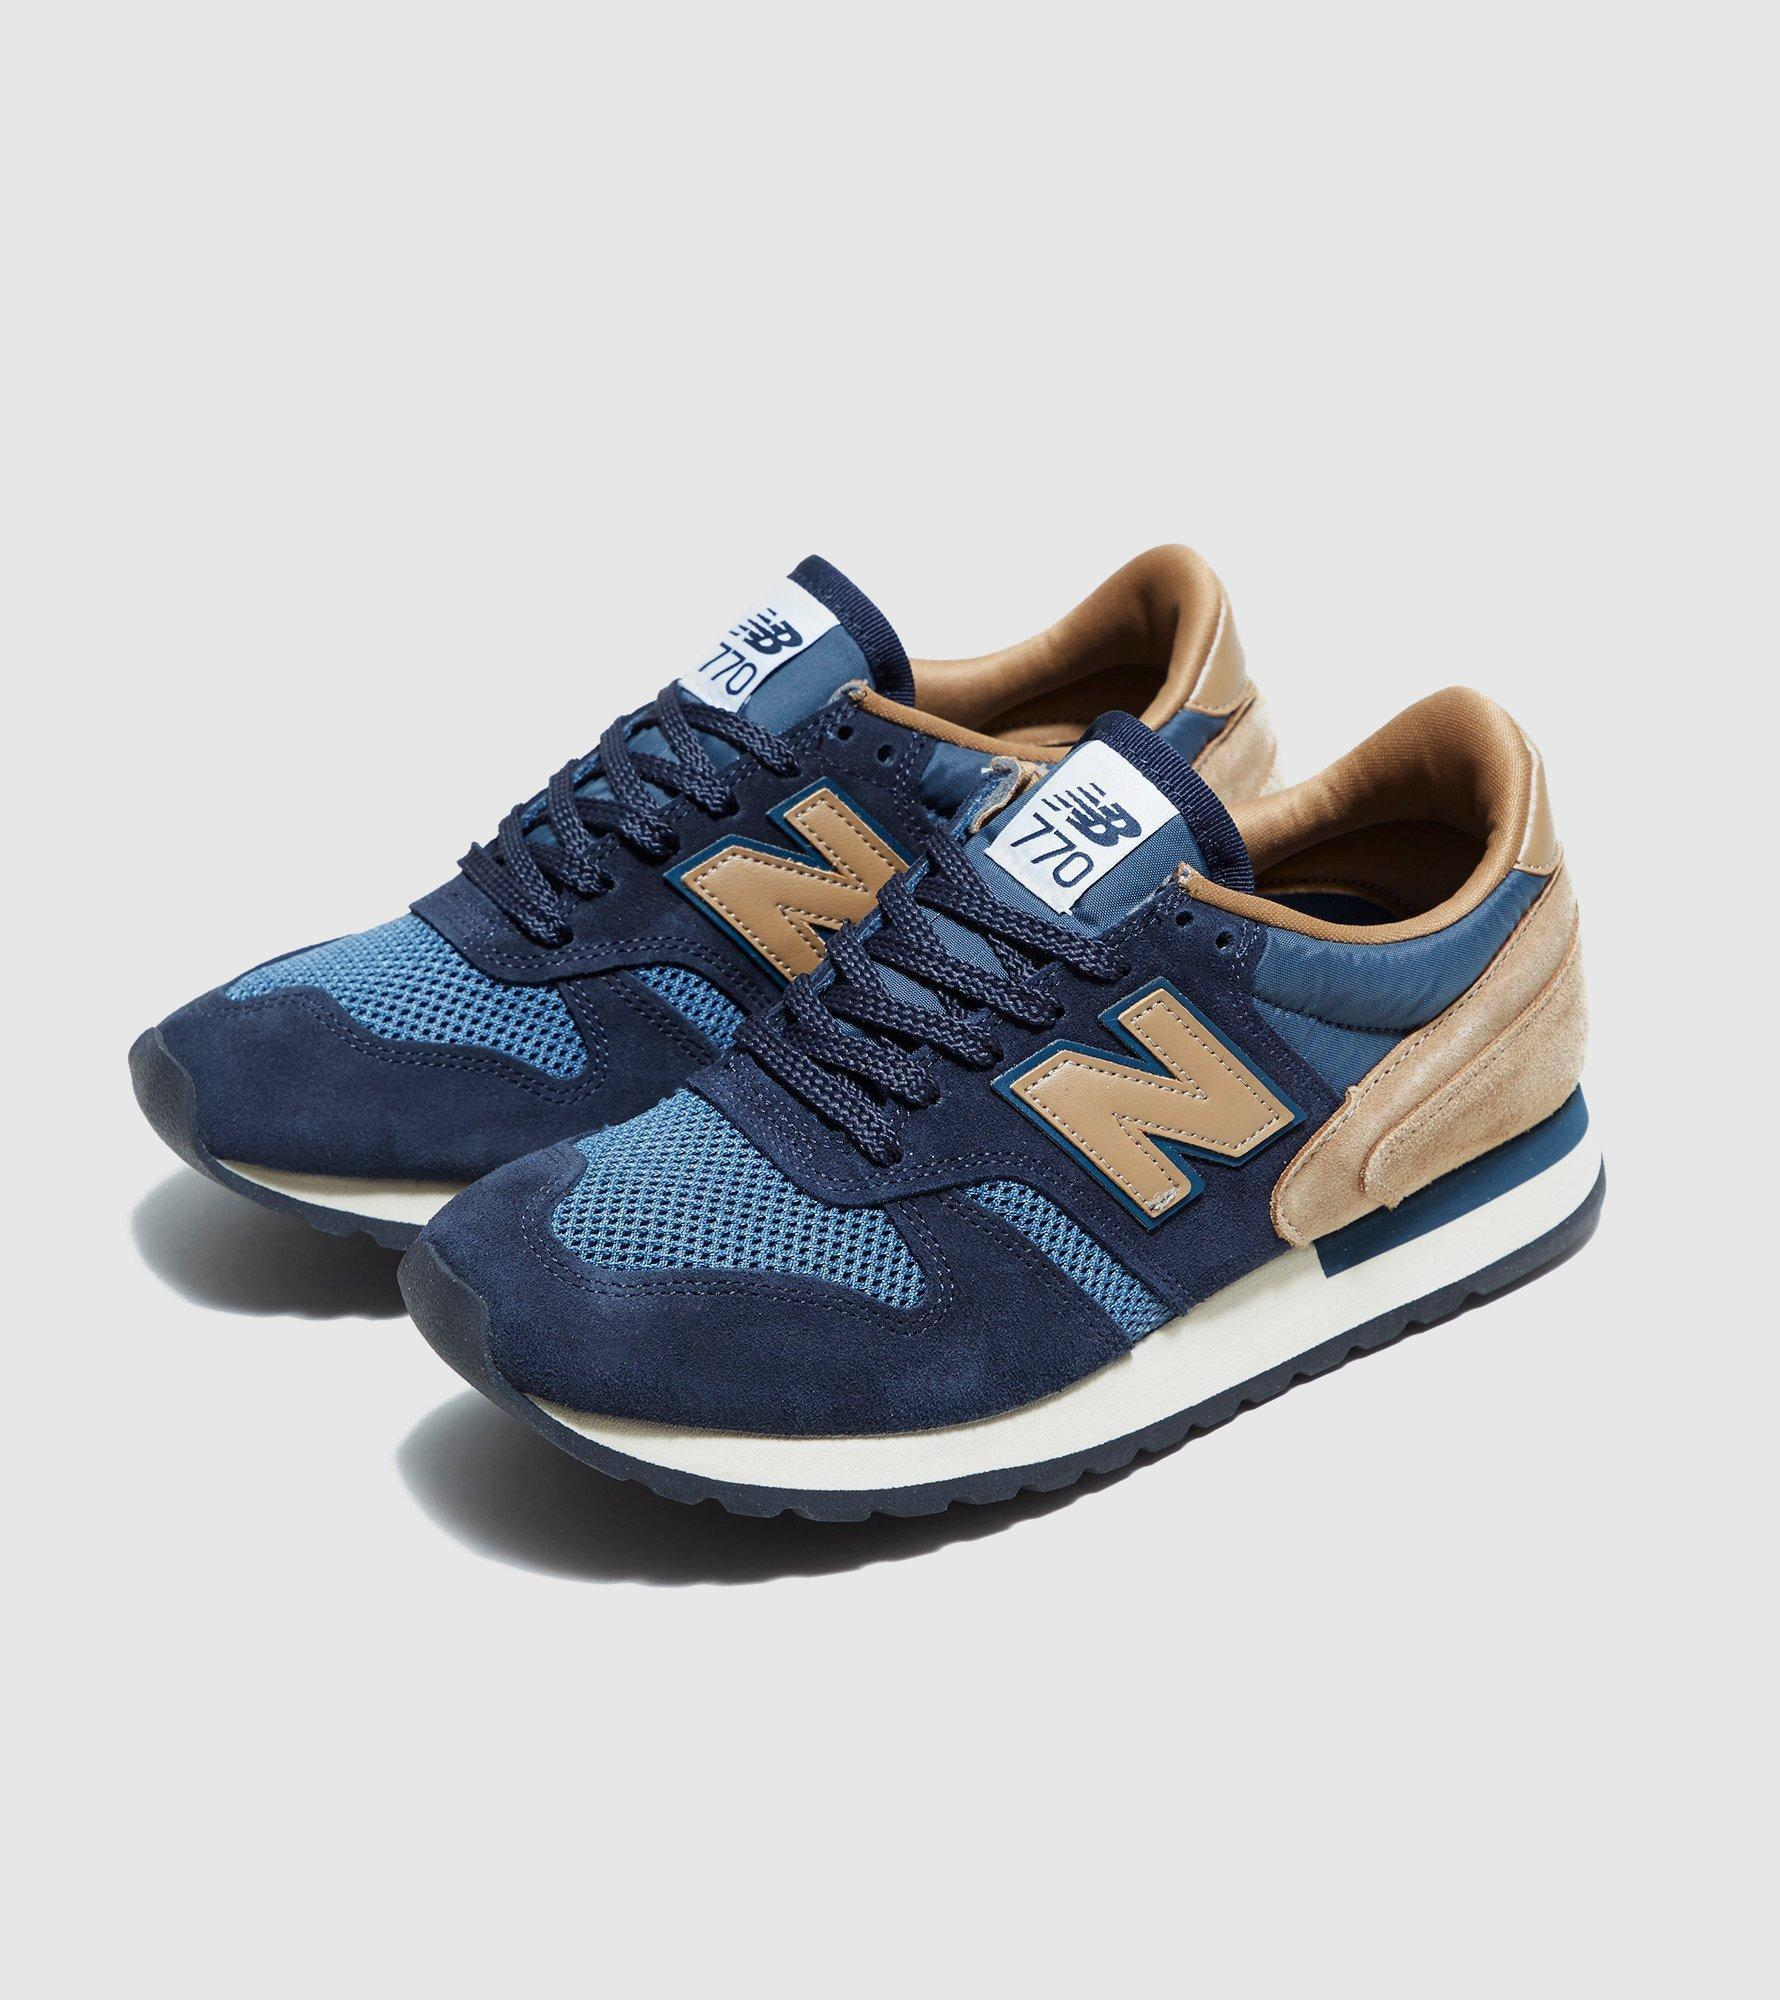 New Balance Shoes Blue Leather